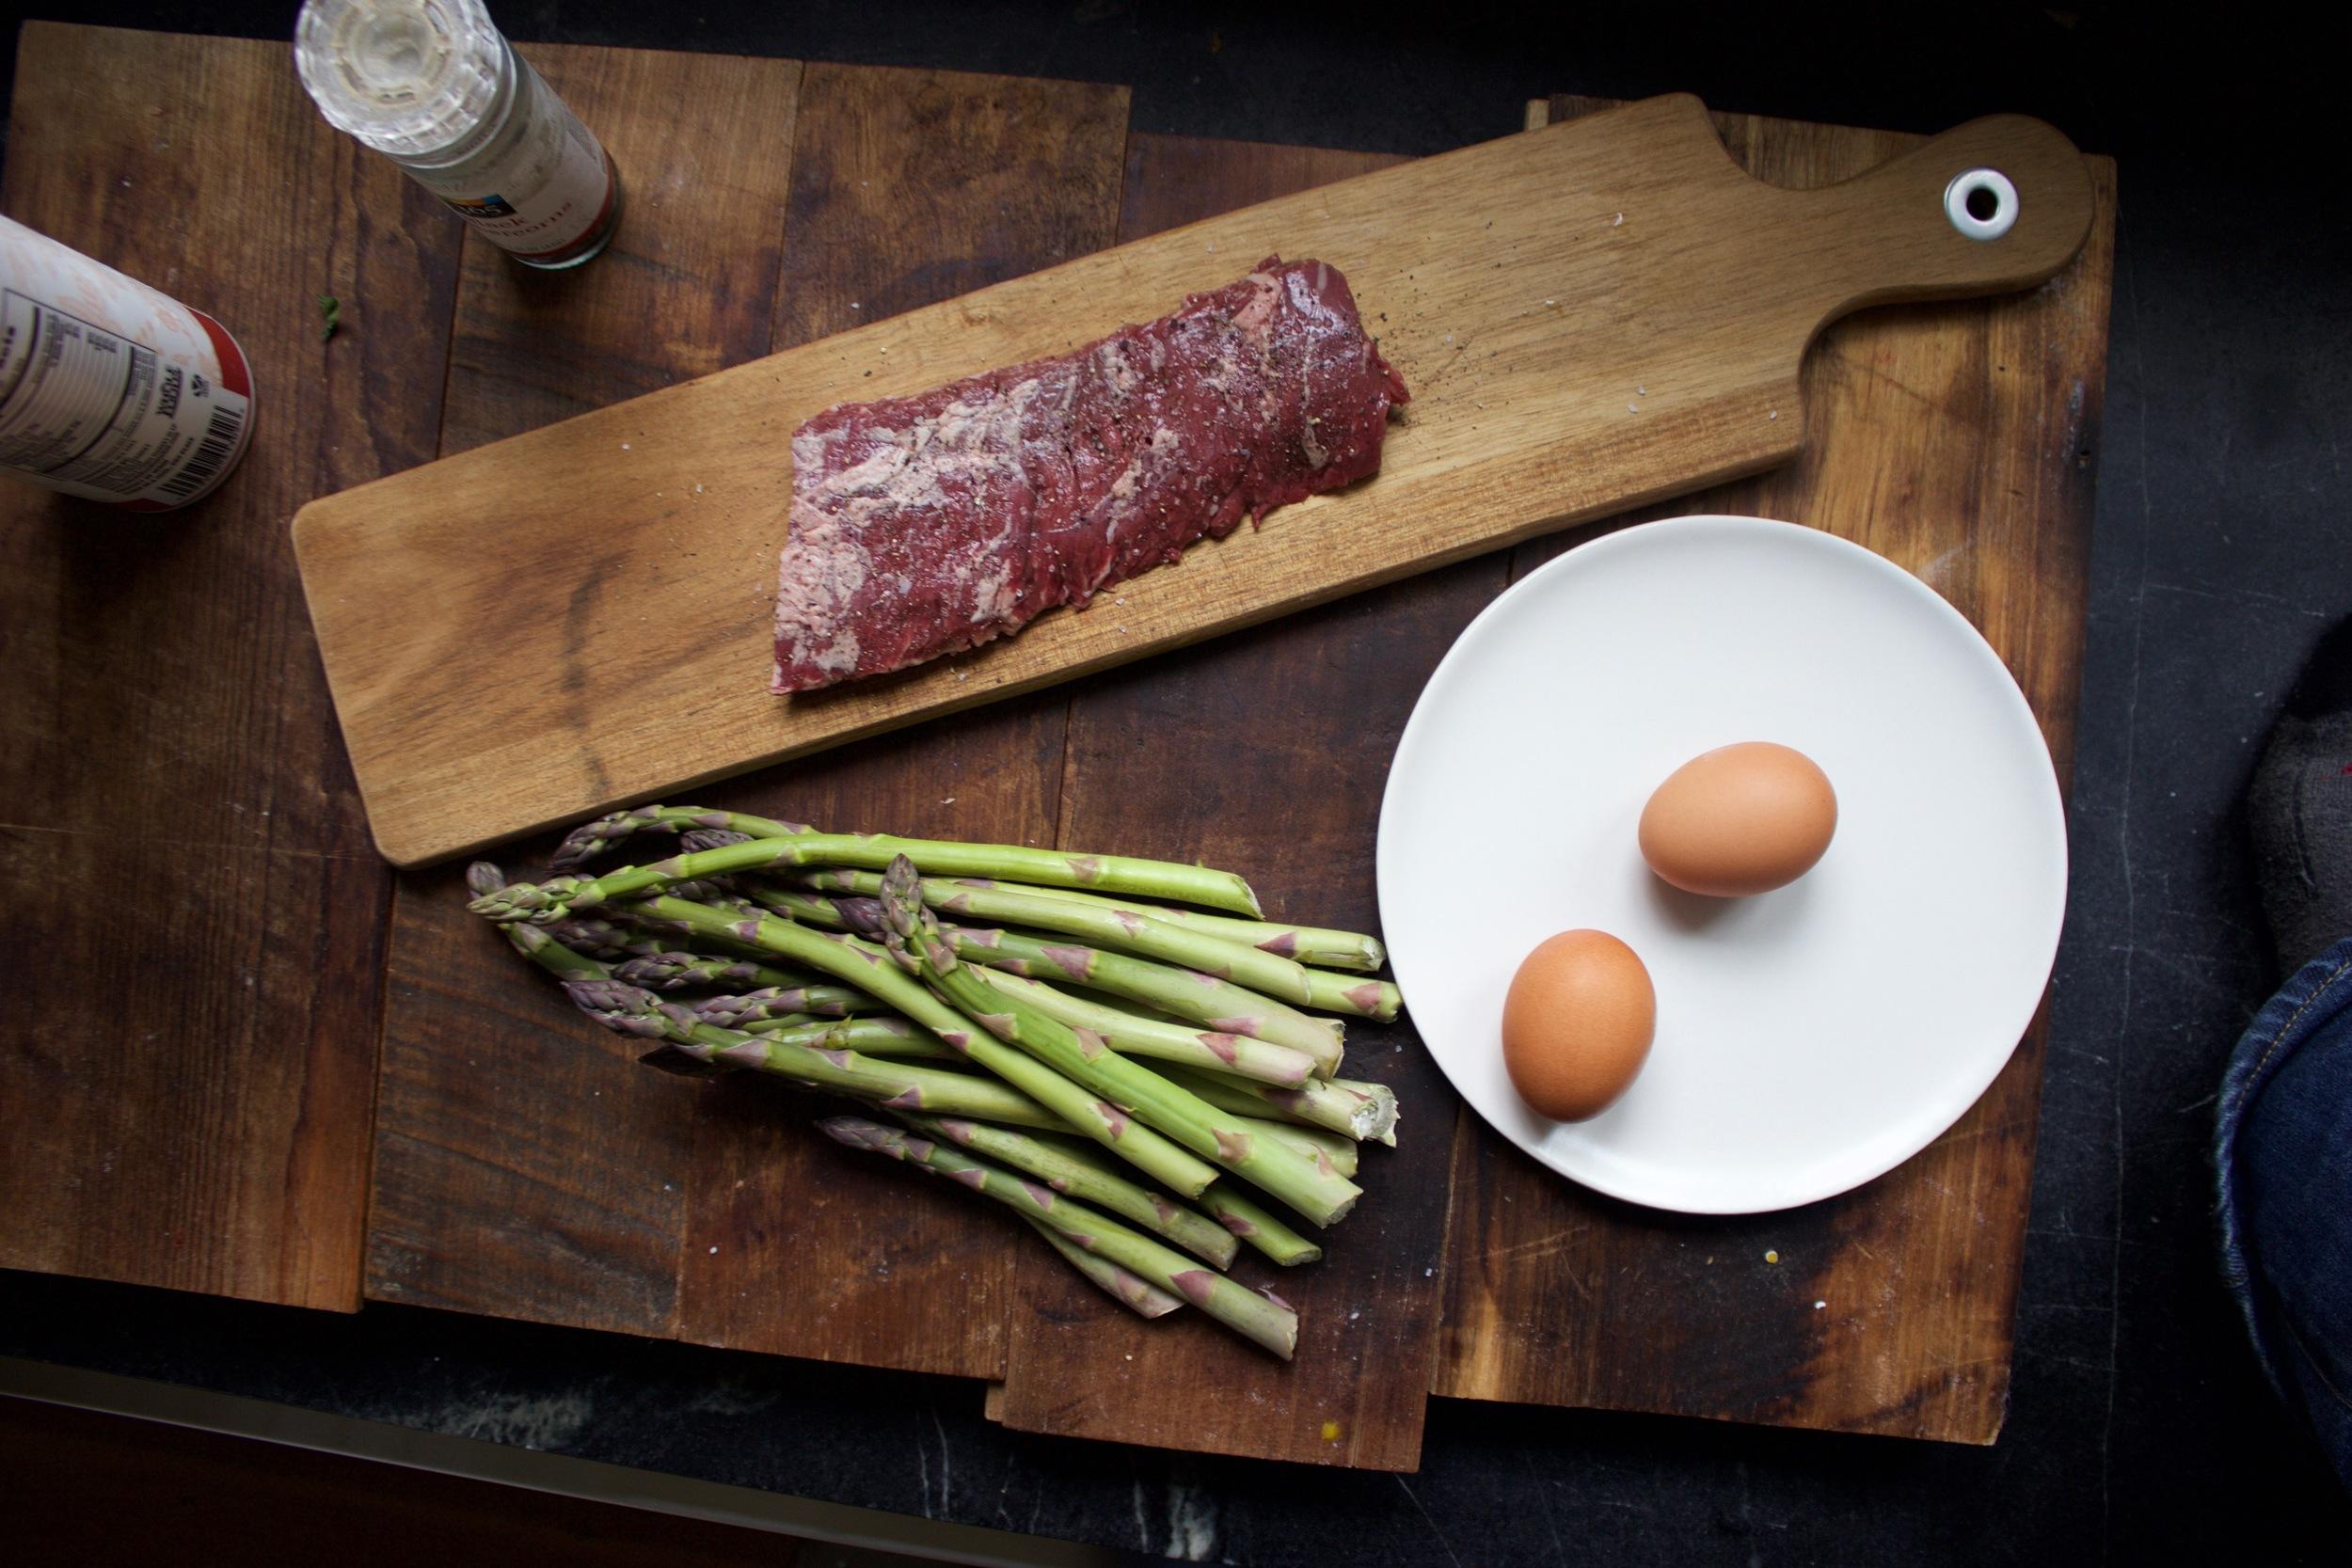 Steak and egg mis en place